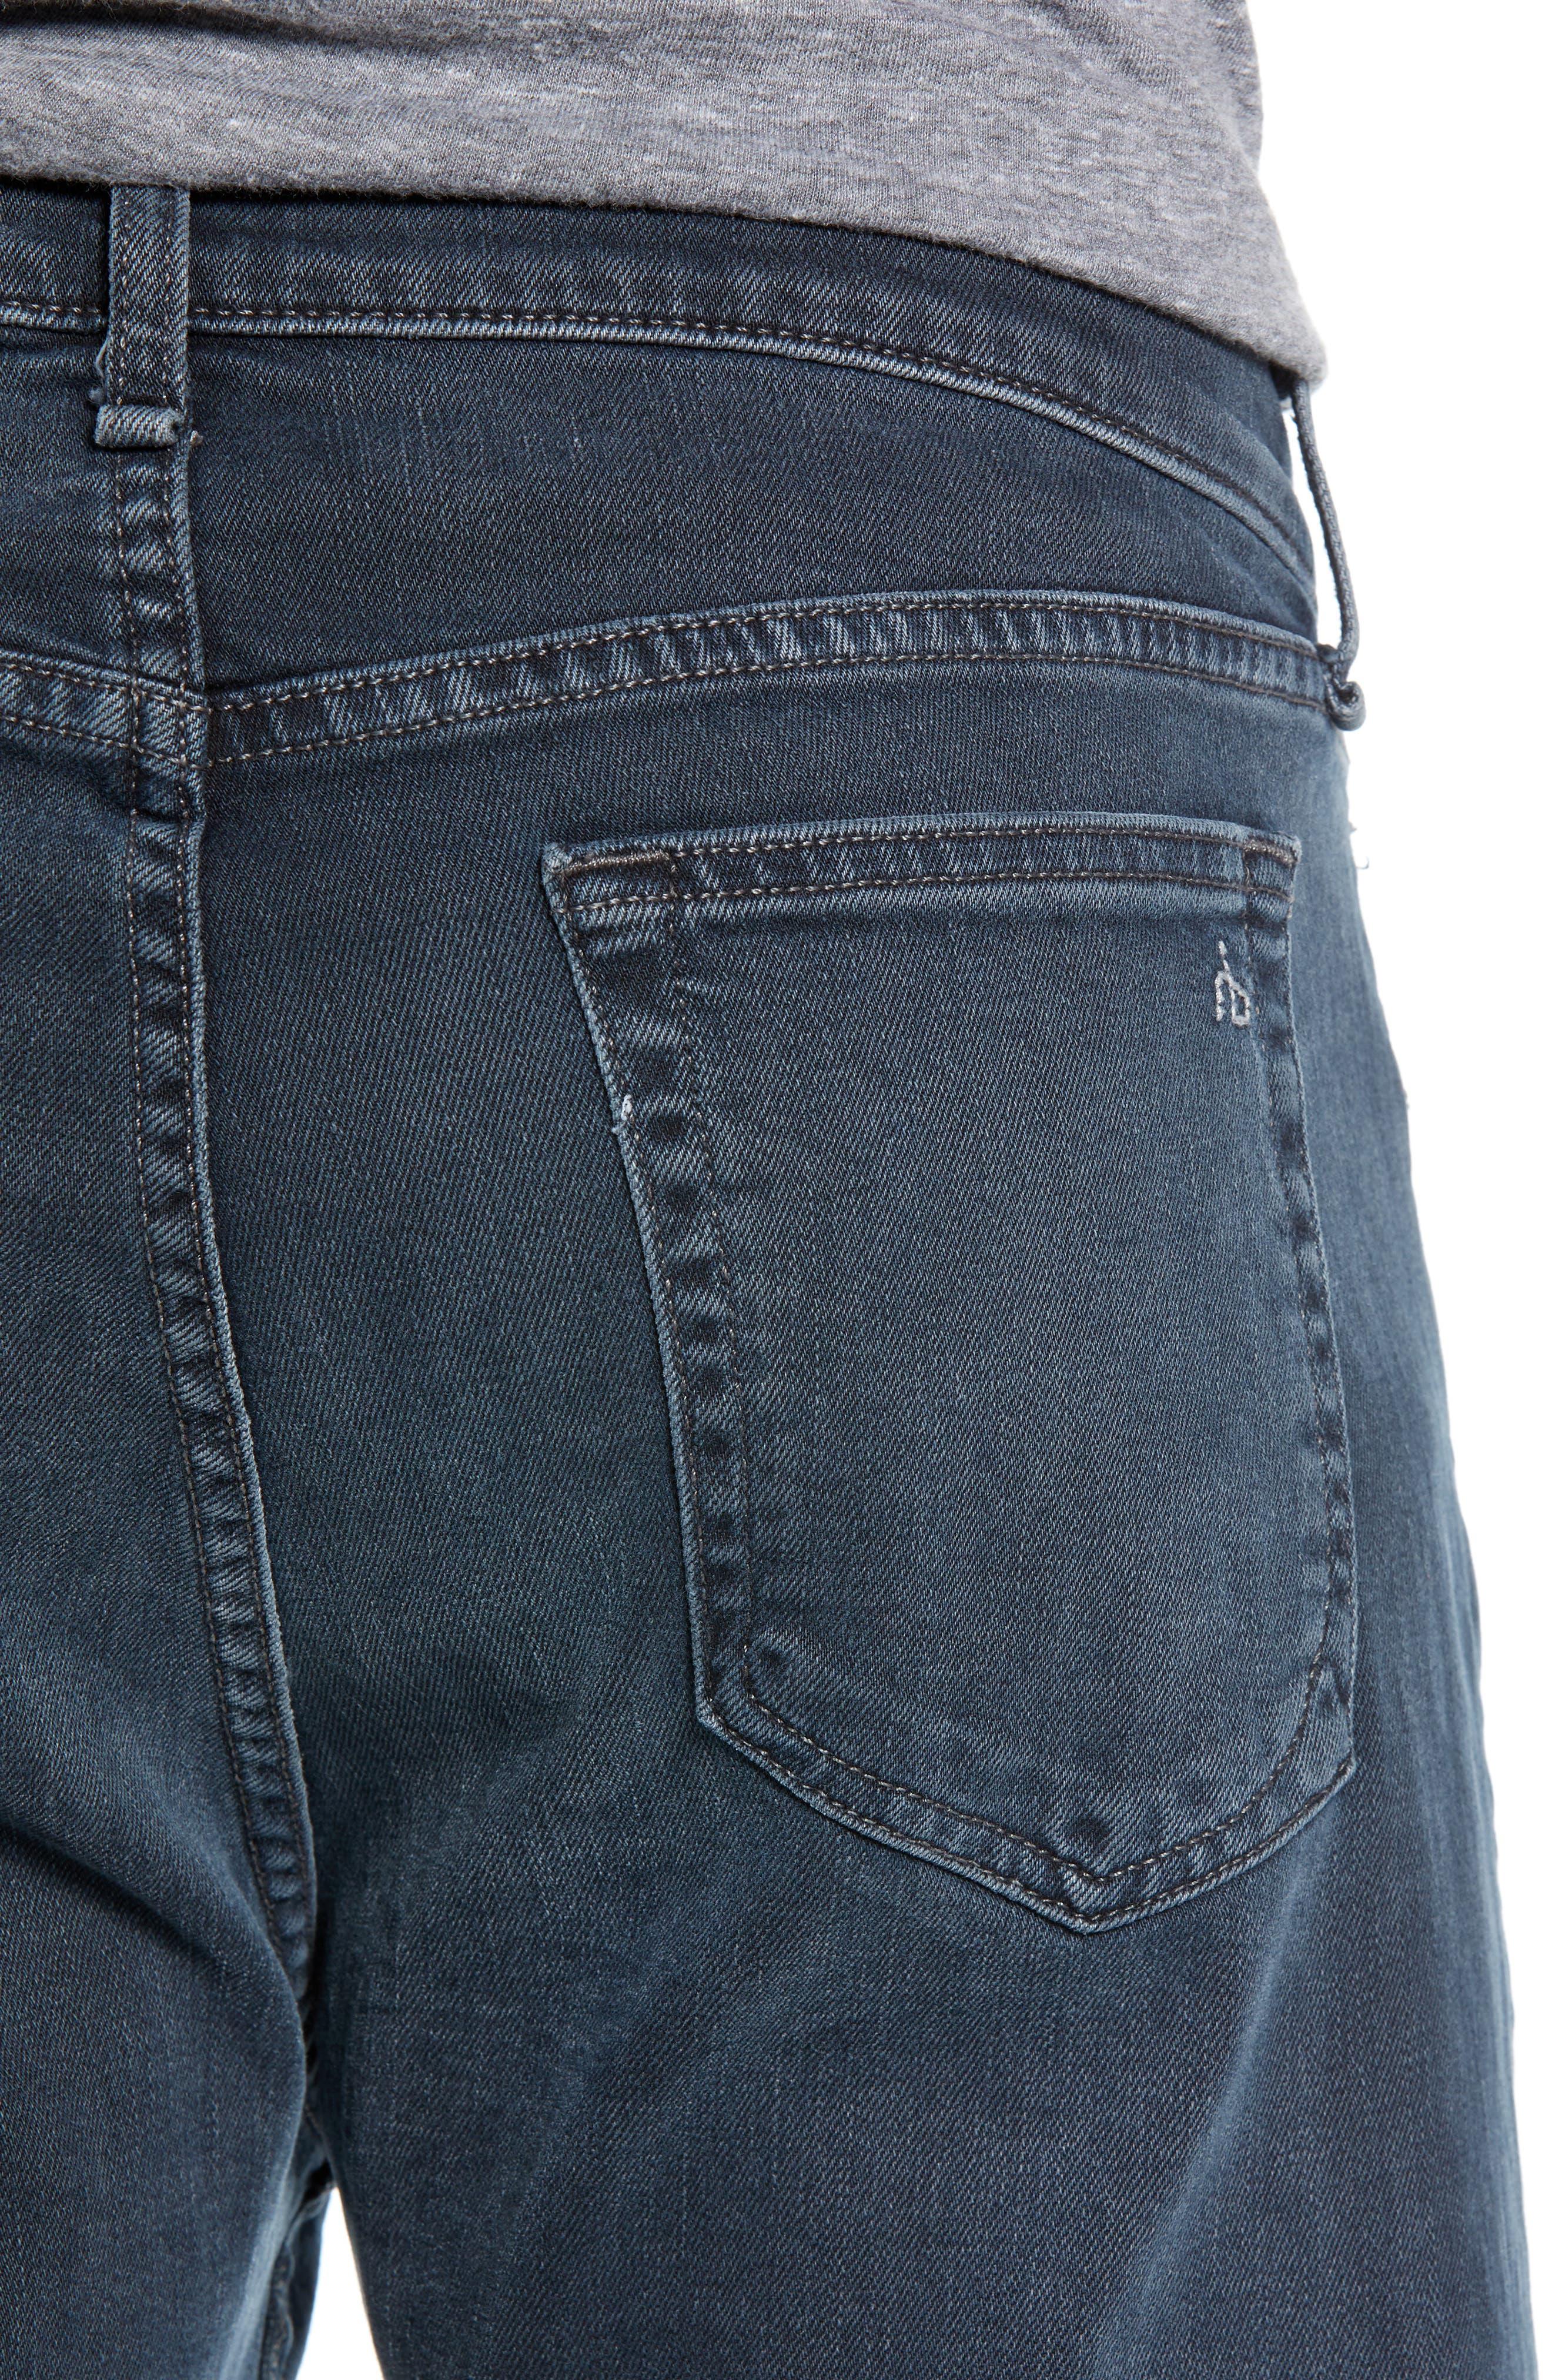 Fit 3 Slim Straight Leg Jeans,                             Alternate thumbnail 4, color,                             MINNA